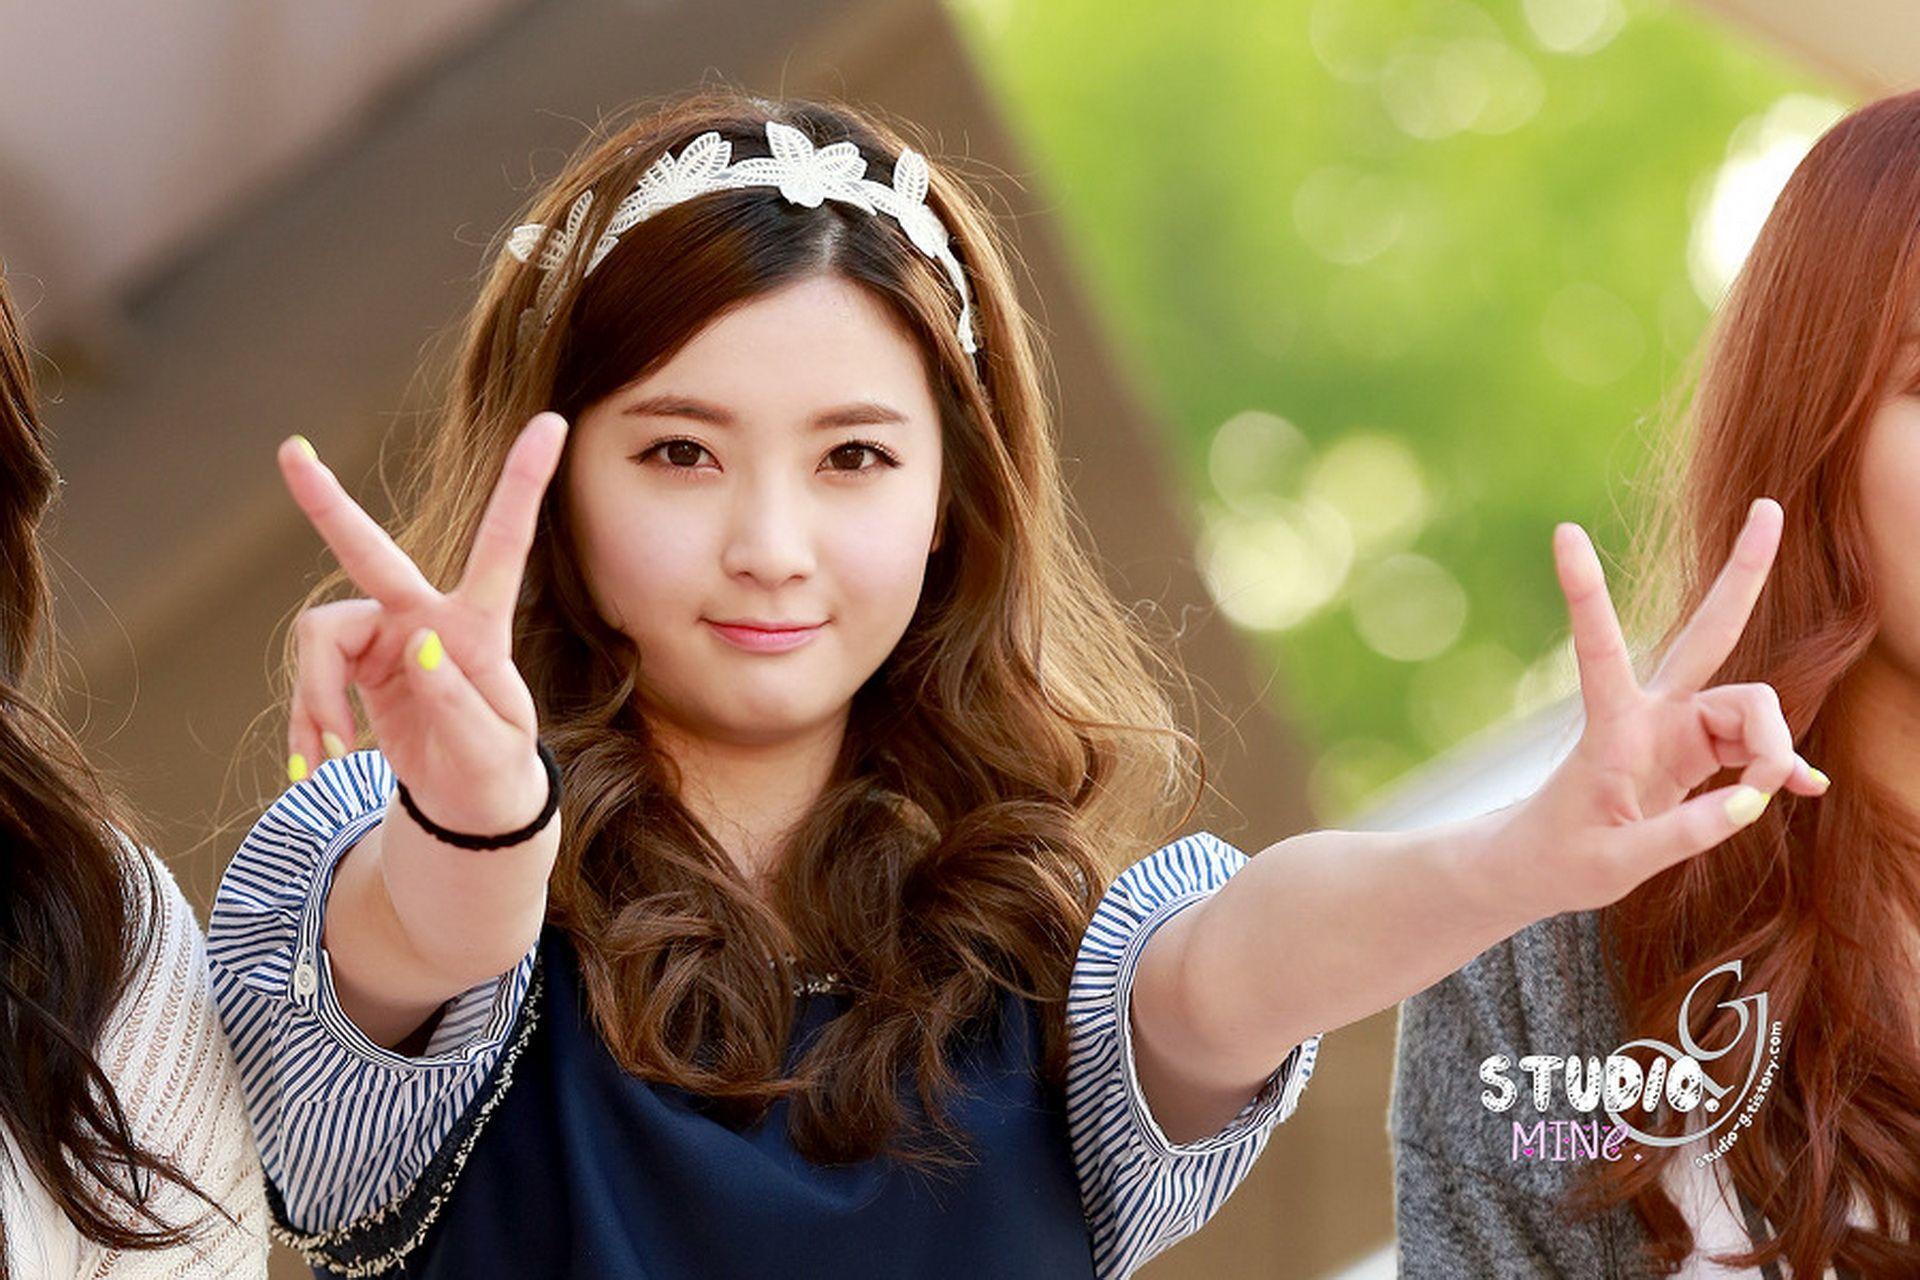 Korean Girl Wallpapers - Top Free Korean Girl Backgrounds ...